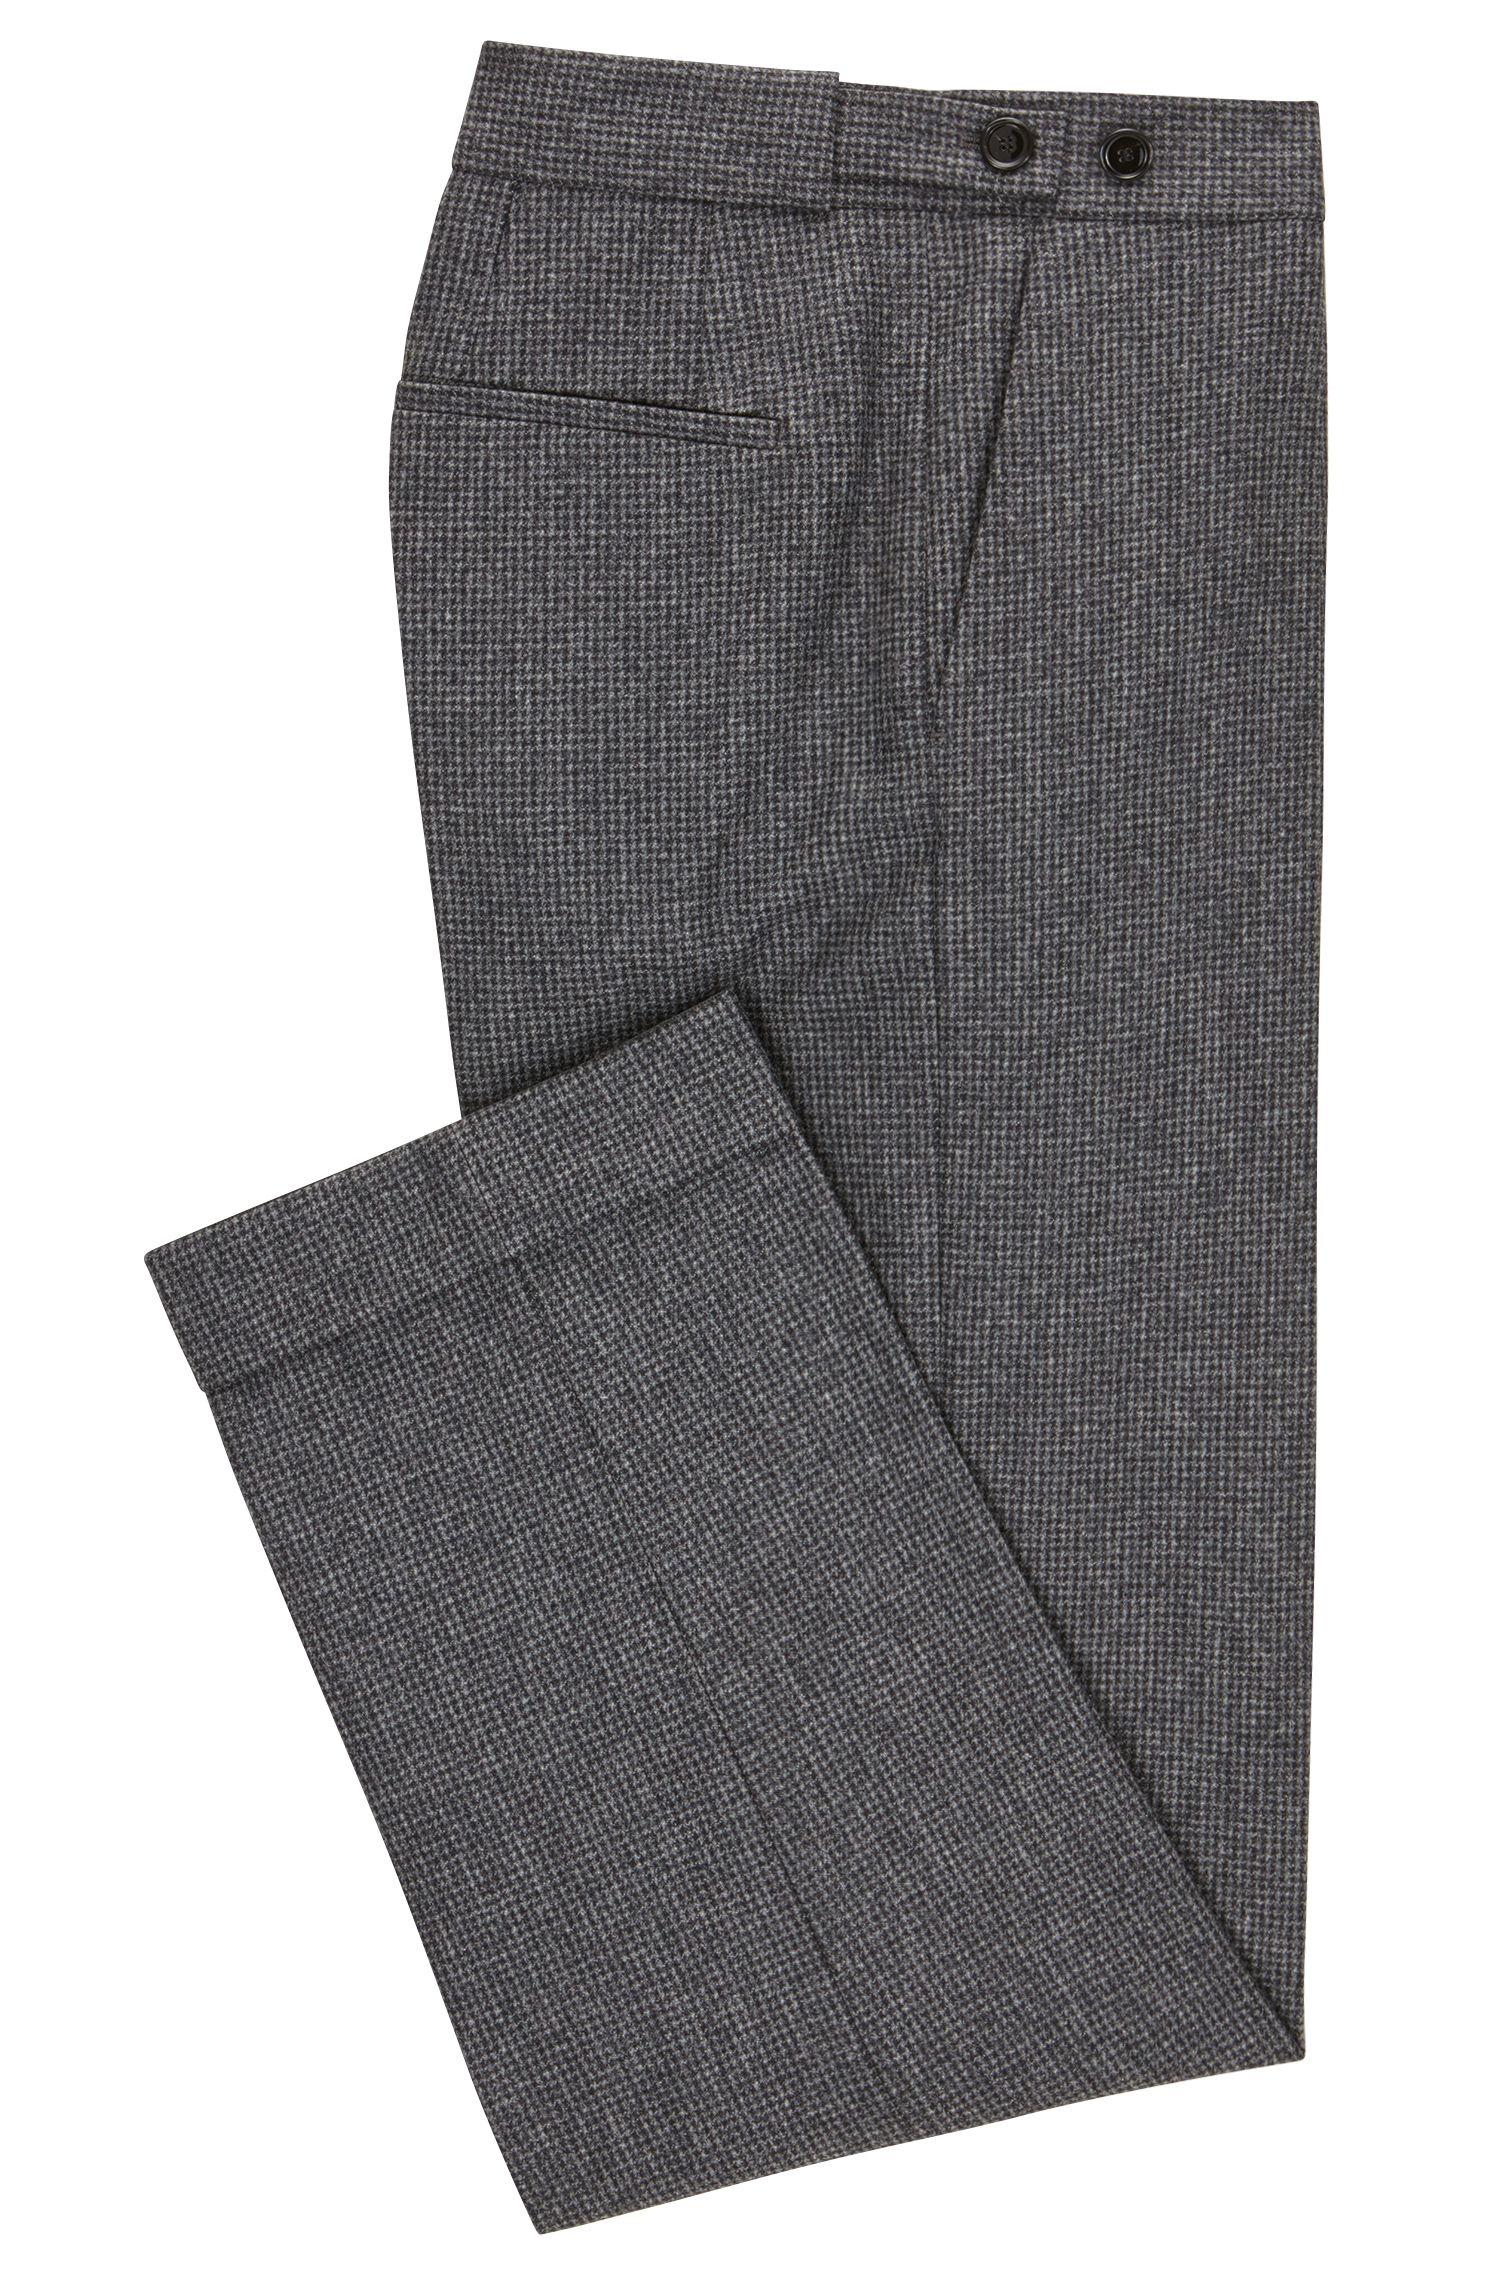 Virgin Wool Dress Pants